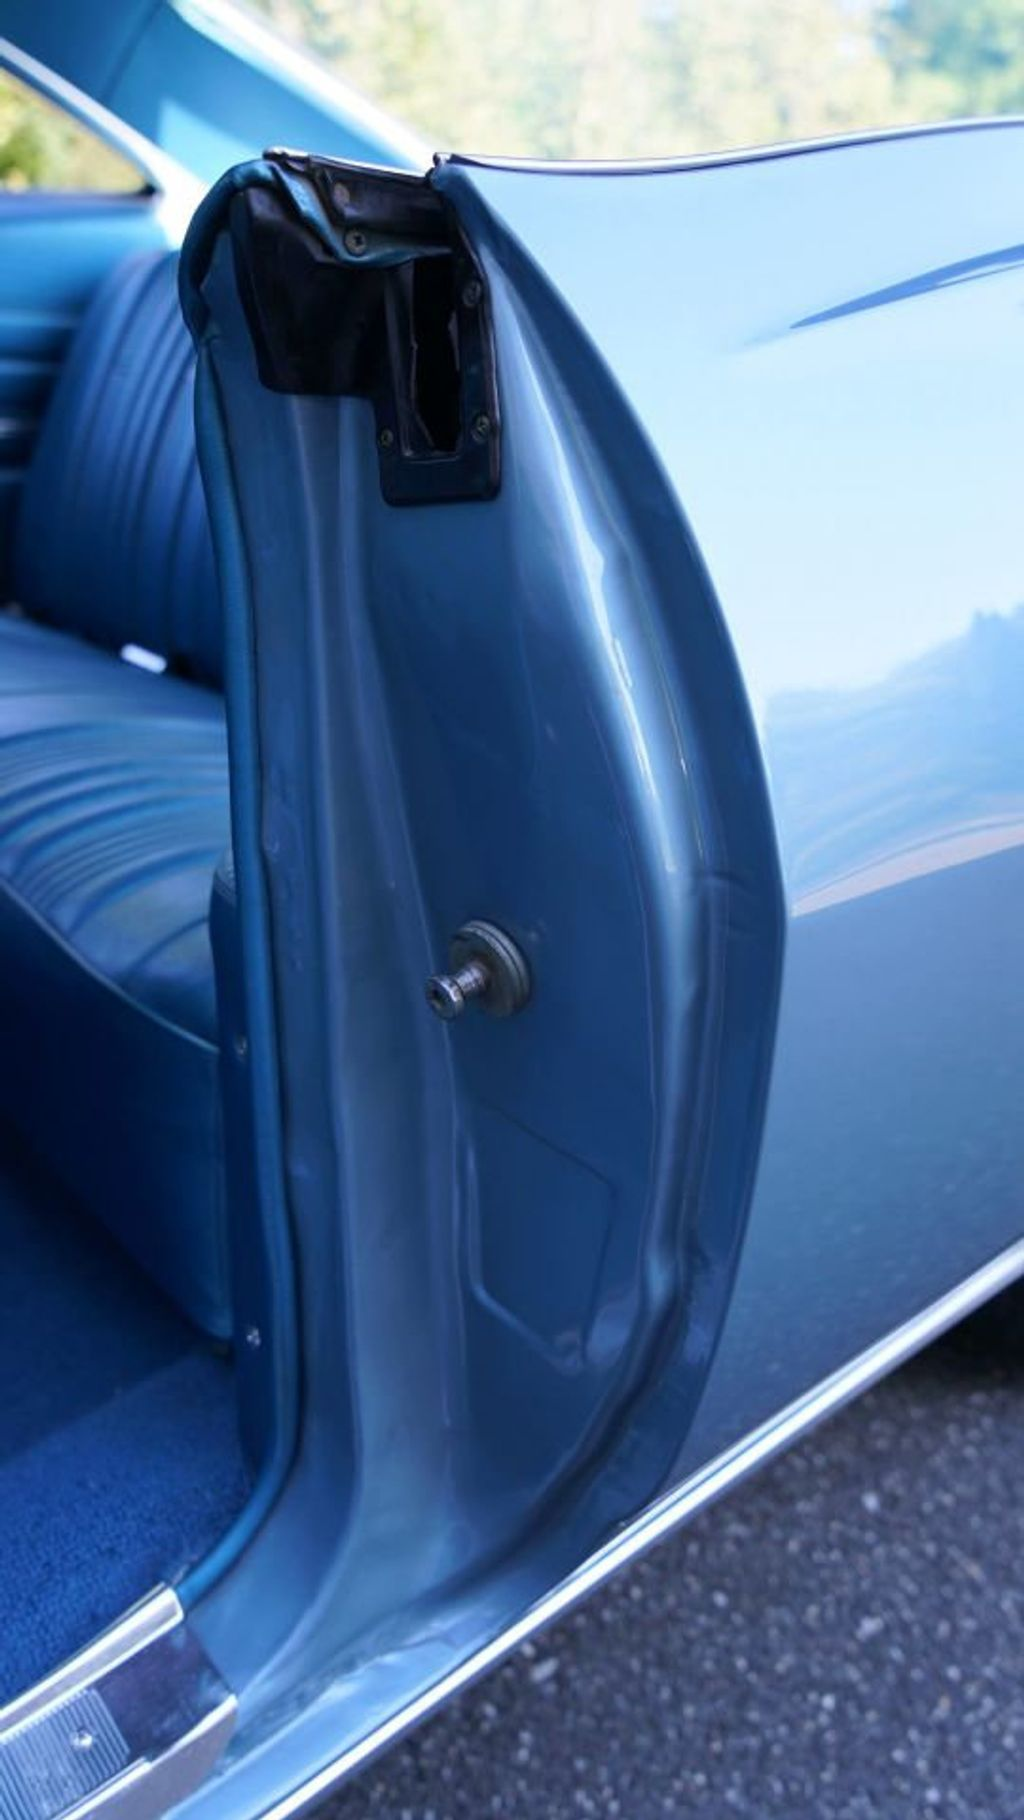 1967 Chevrolet Impala SS Fastback - 18258219 - 53